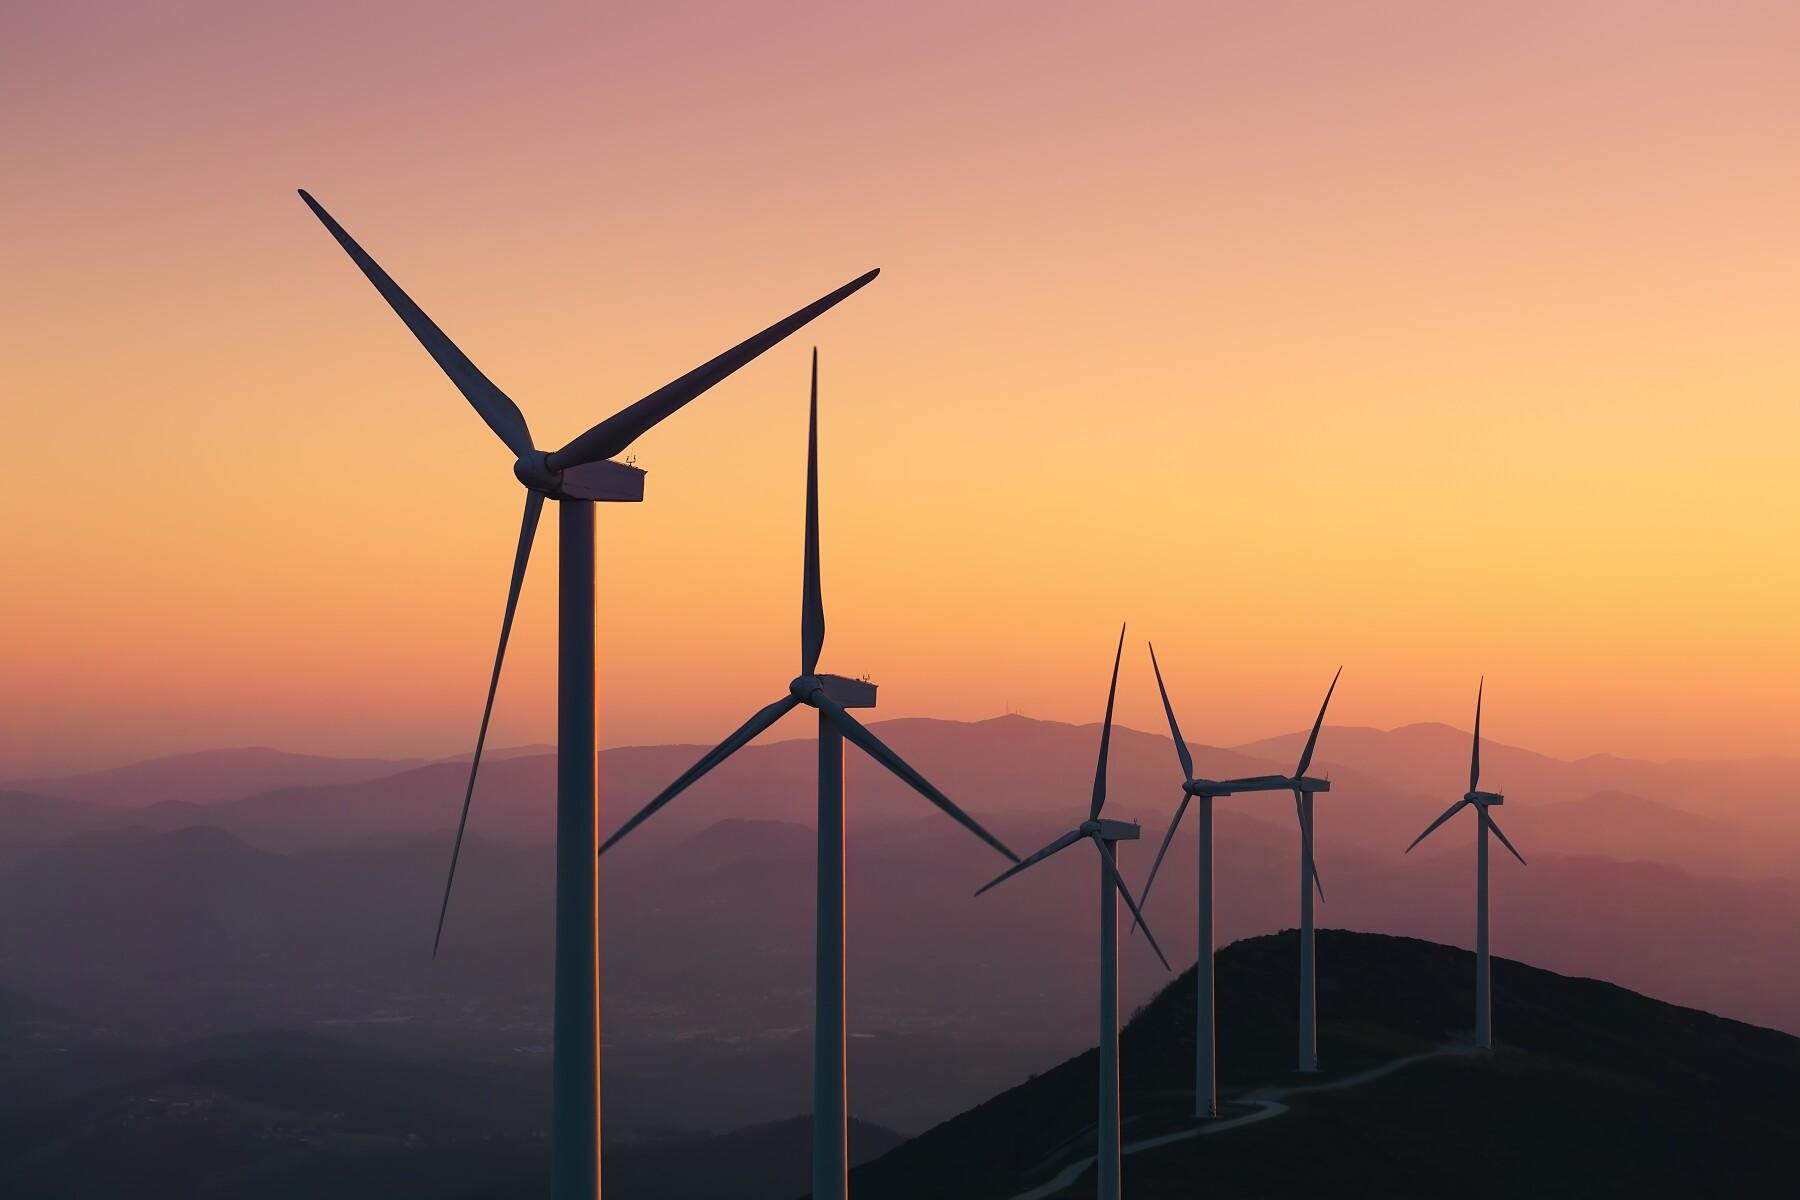 renewable energy with wind turbines